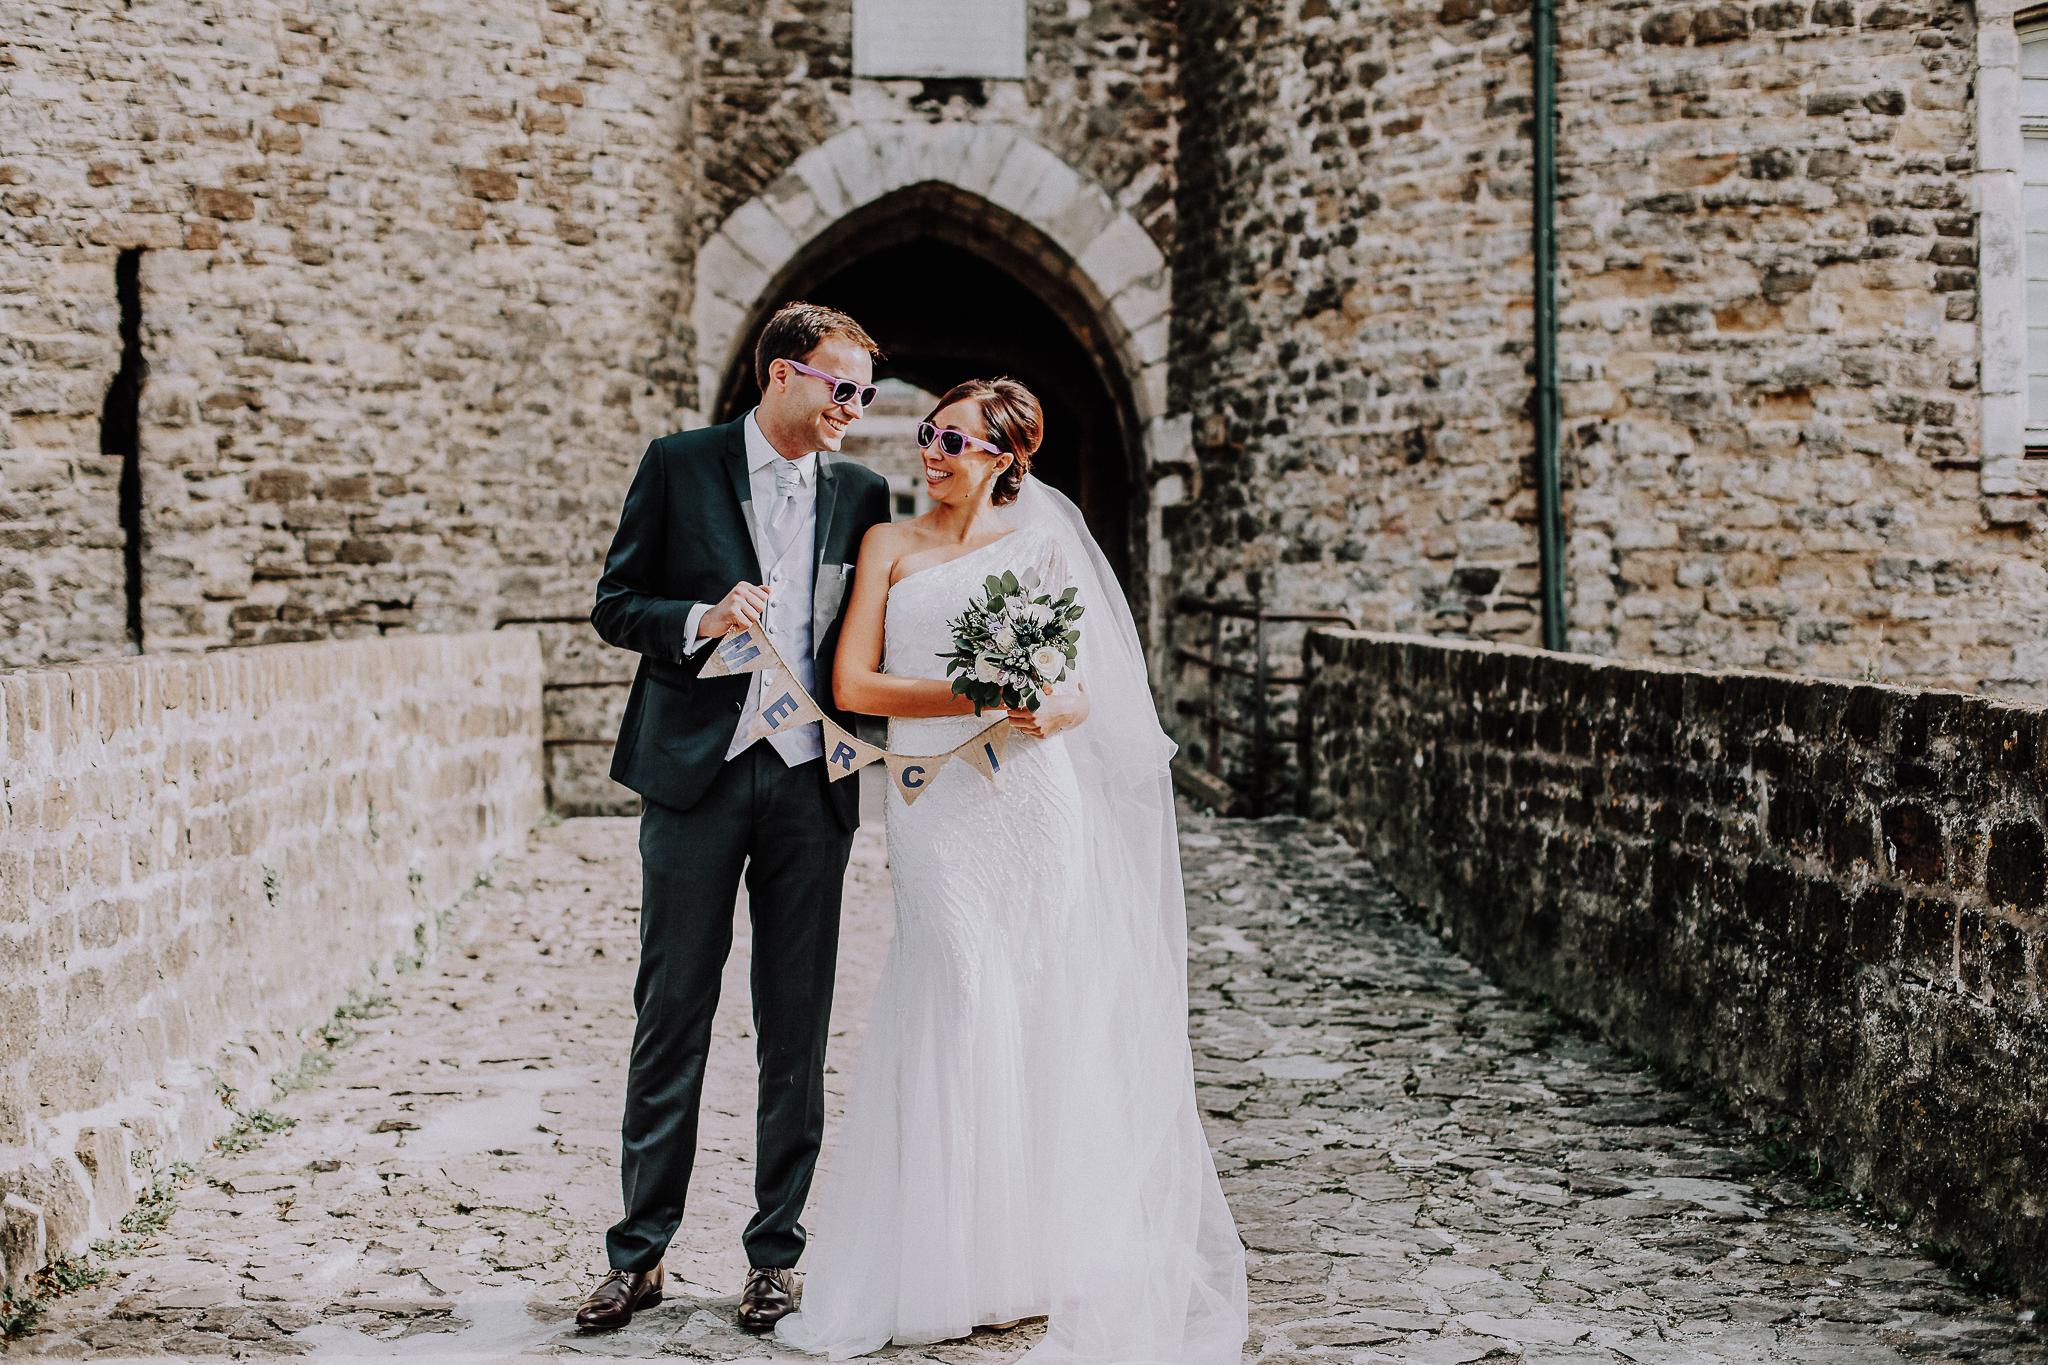 mariage Côte d'Opale, Mariage Nord pas de Calais, Mariage Hauts de France, Mariage, French Wedding, Wedding Decor, Dixie Martin Photography, Mariage Boulogne Sur Mer